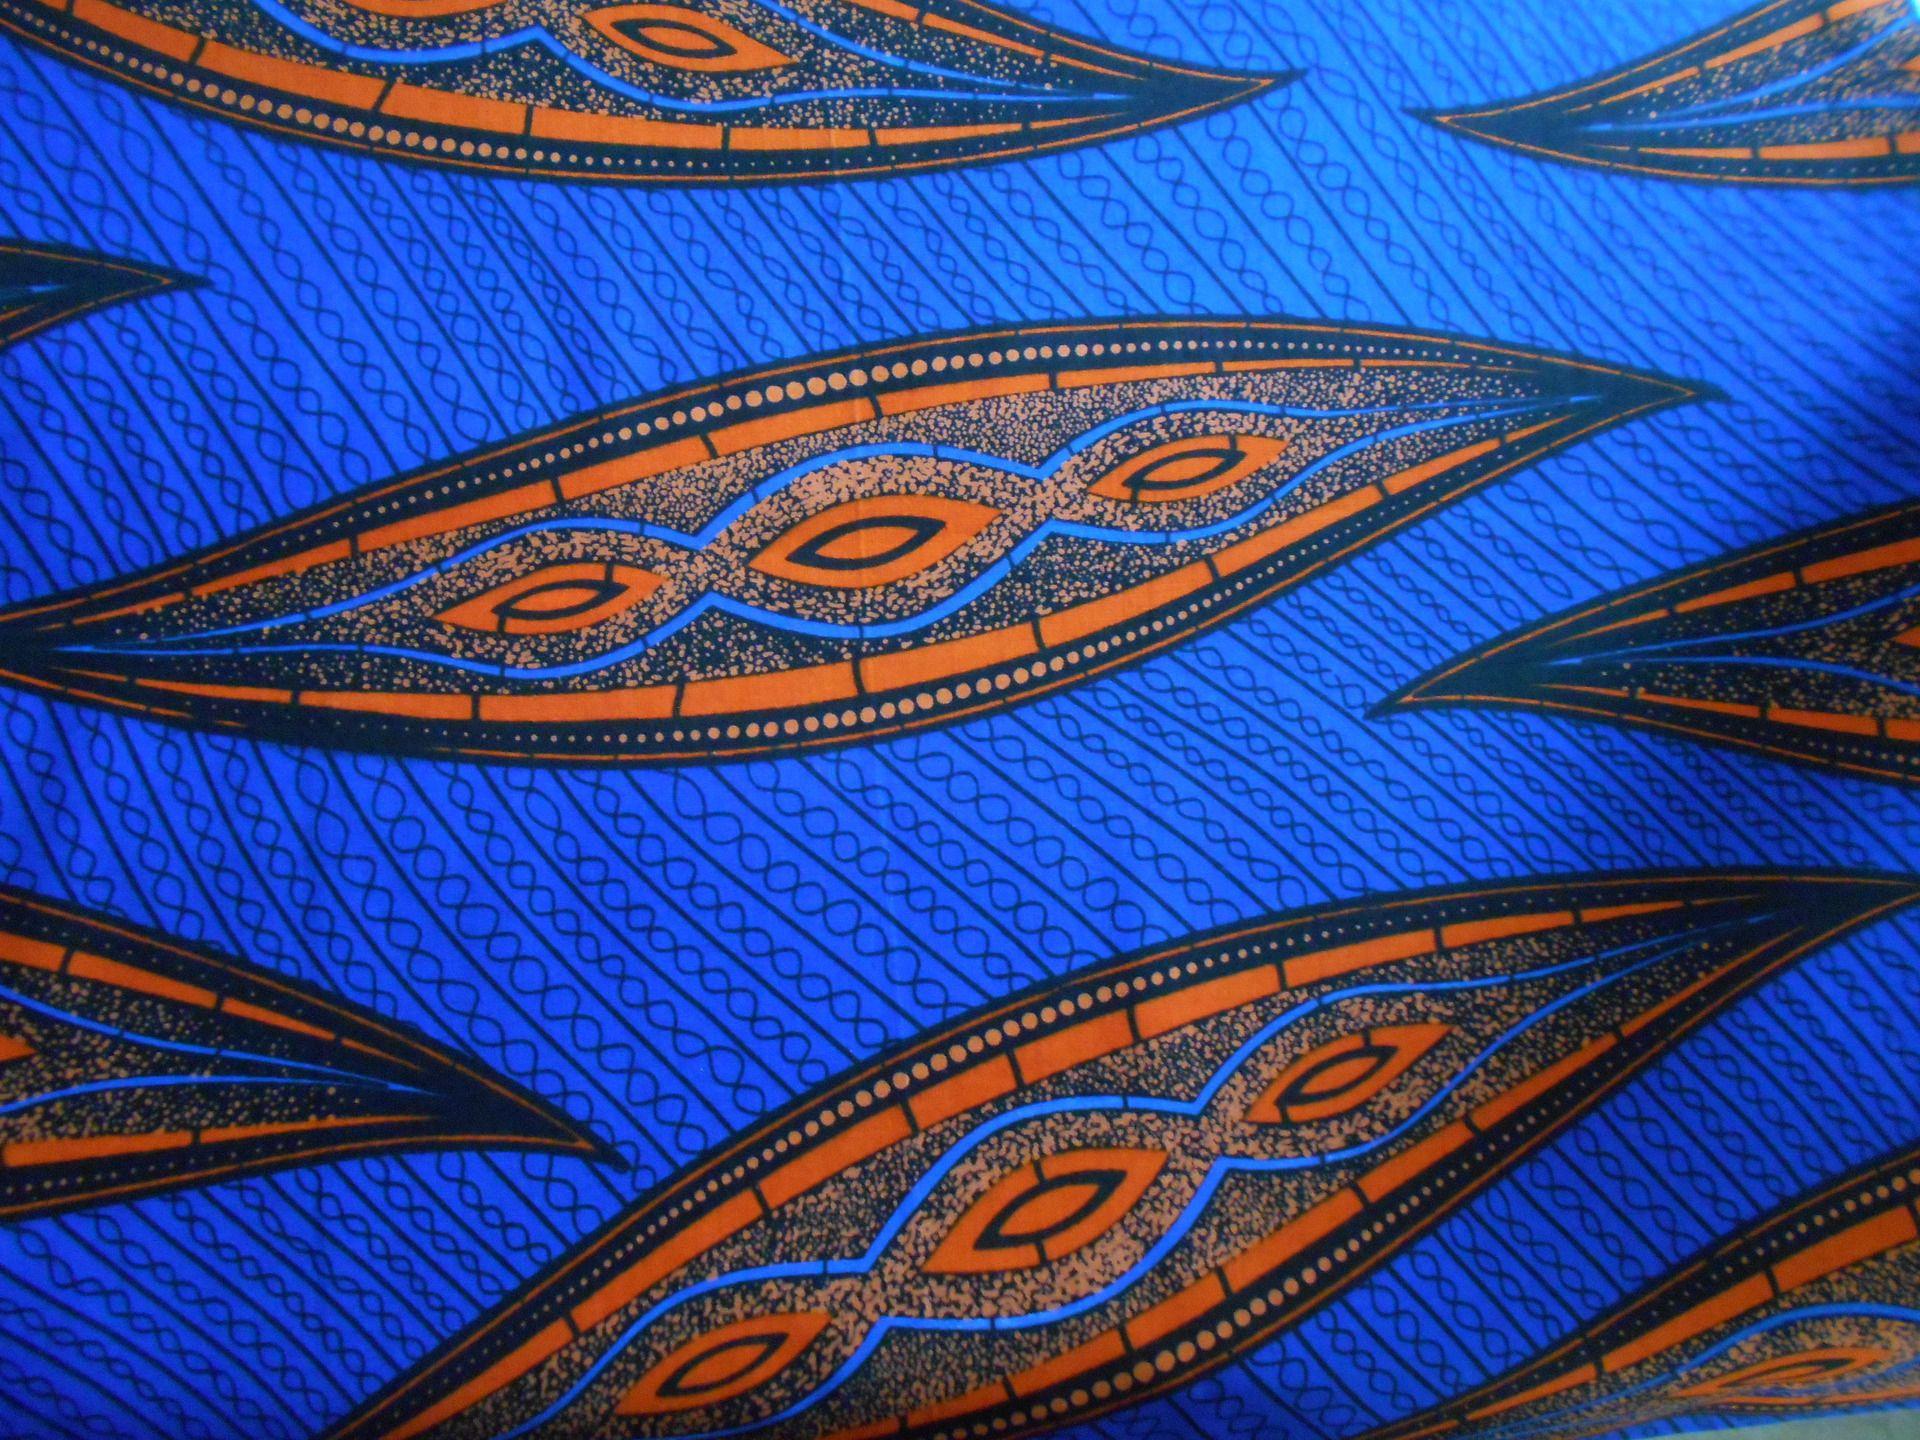 tissu africain rare